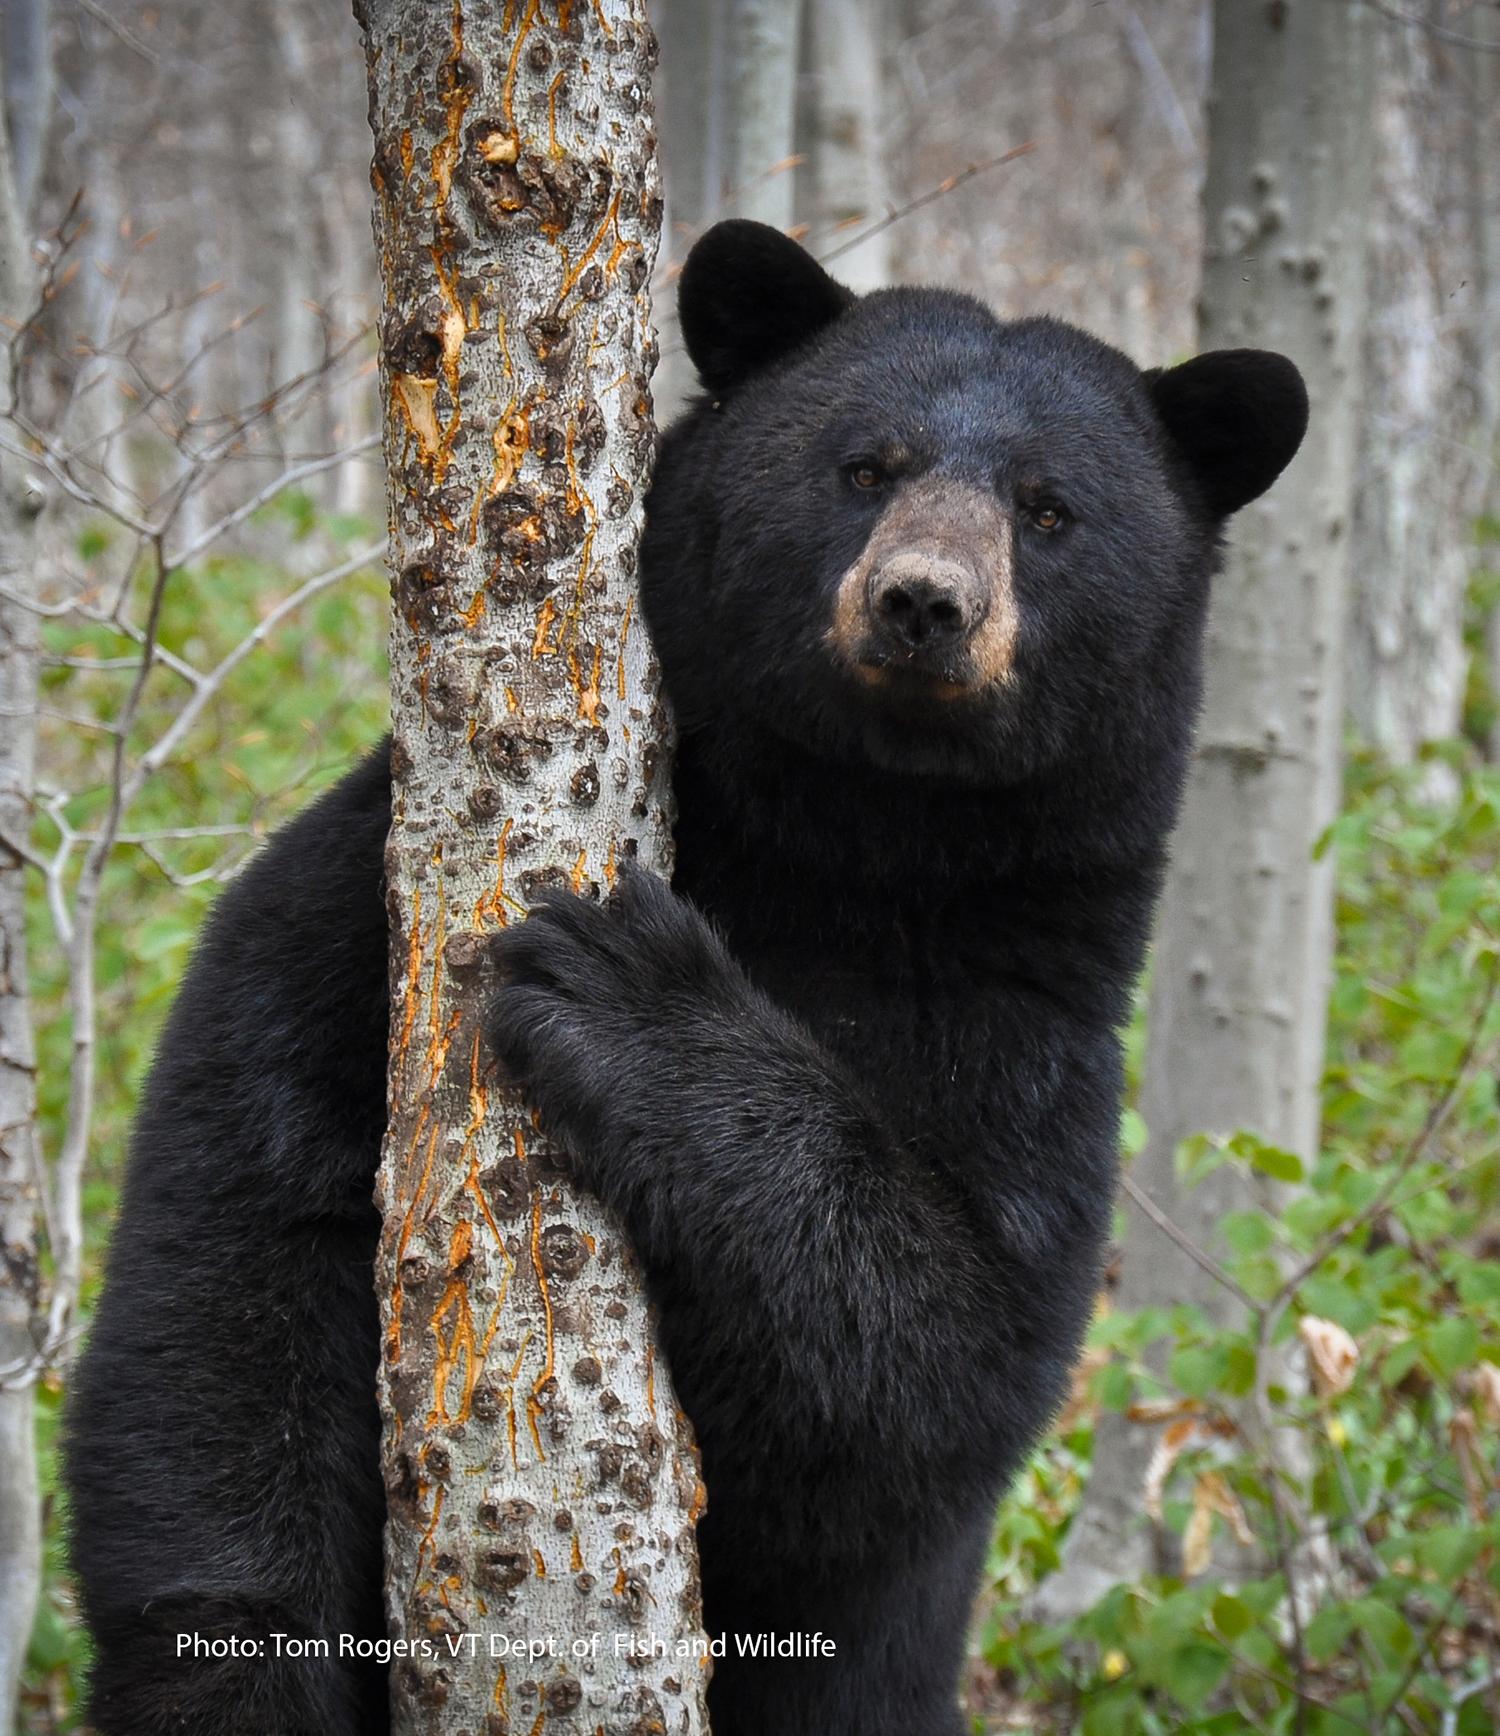 black-bear-tom-rogers(1)sm.jpg